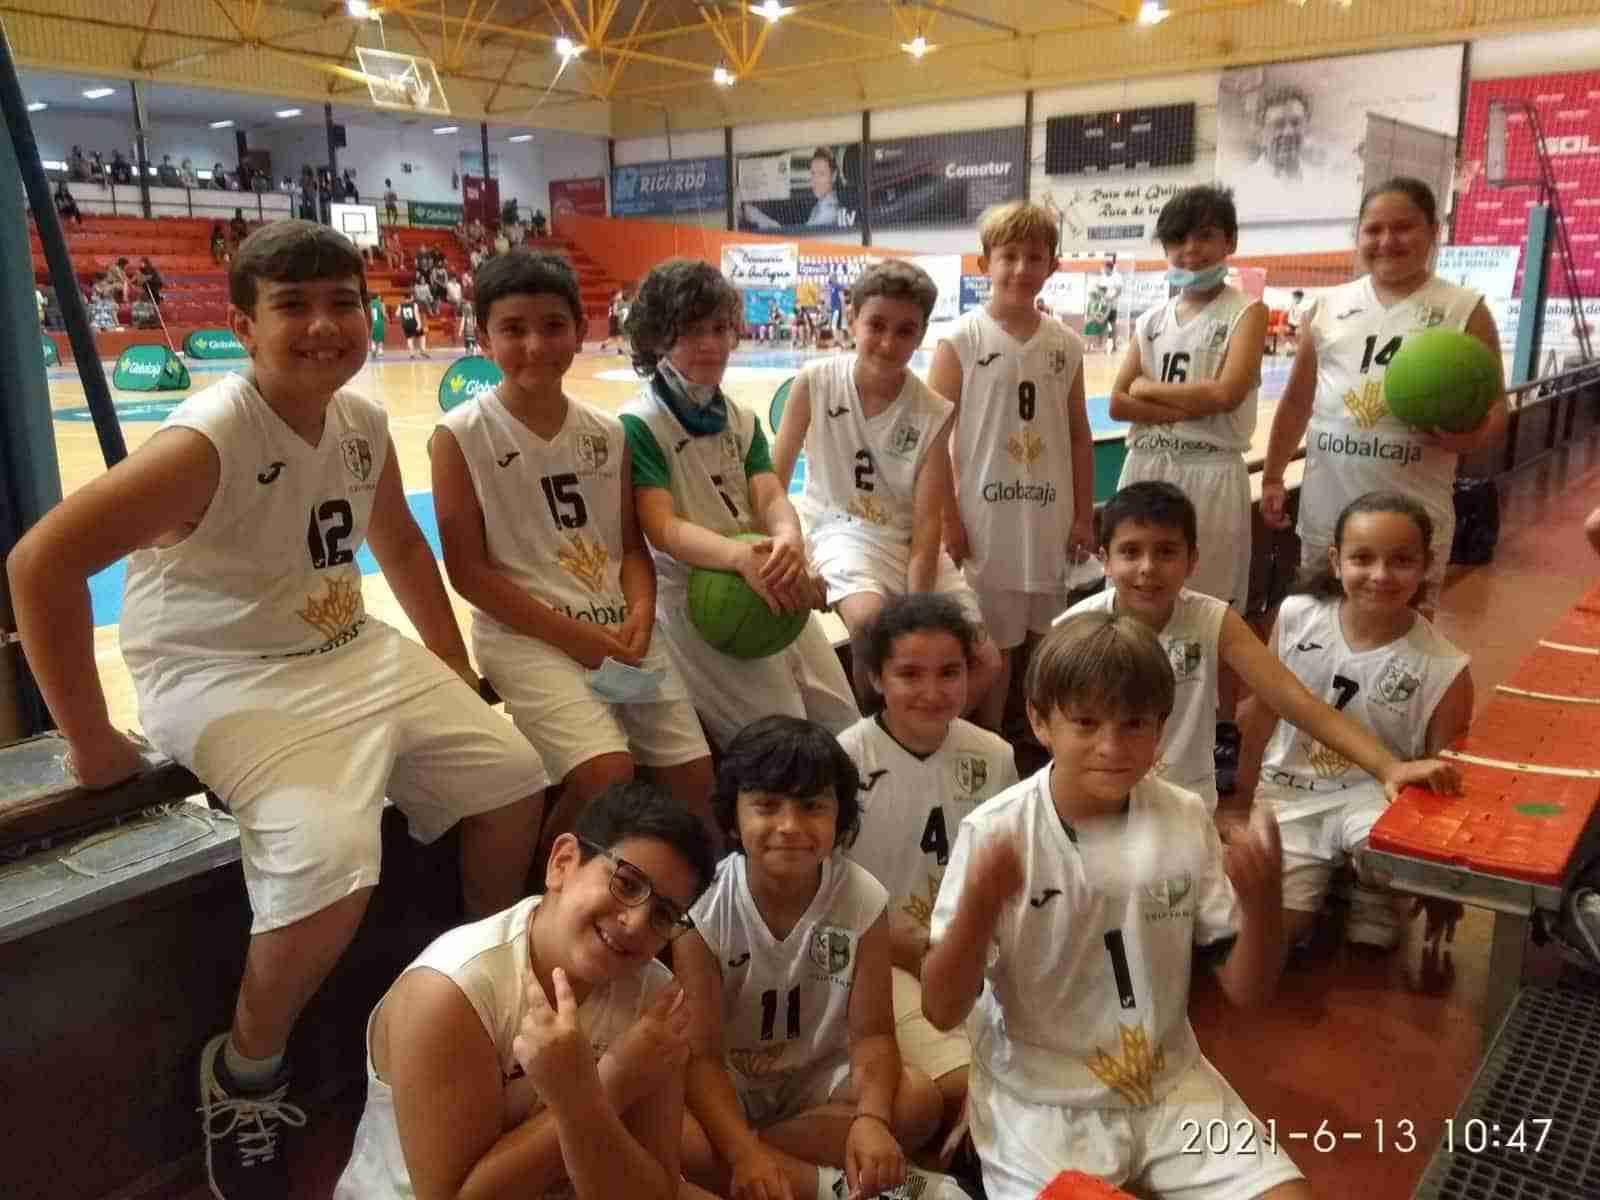 Nuevo fin de semana cargado de éxitos para el Baloncesto Criptana 7